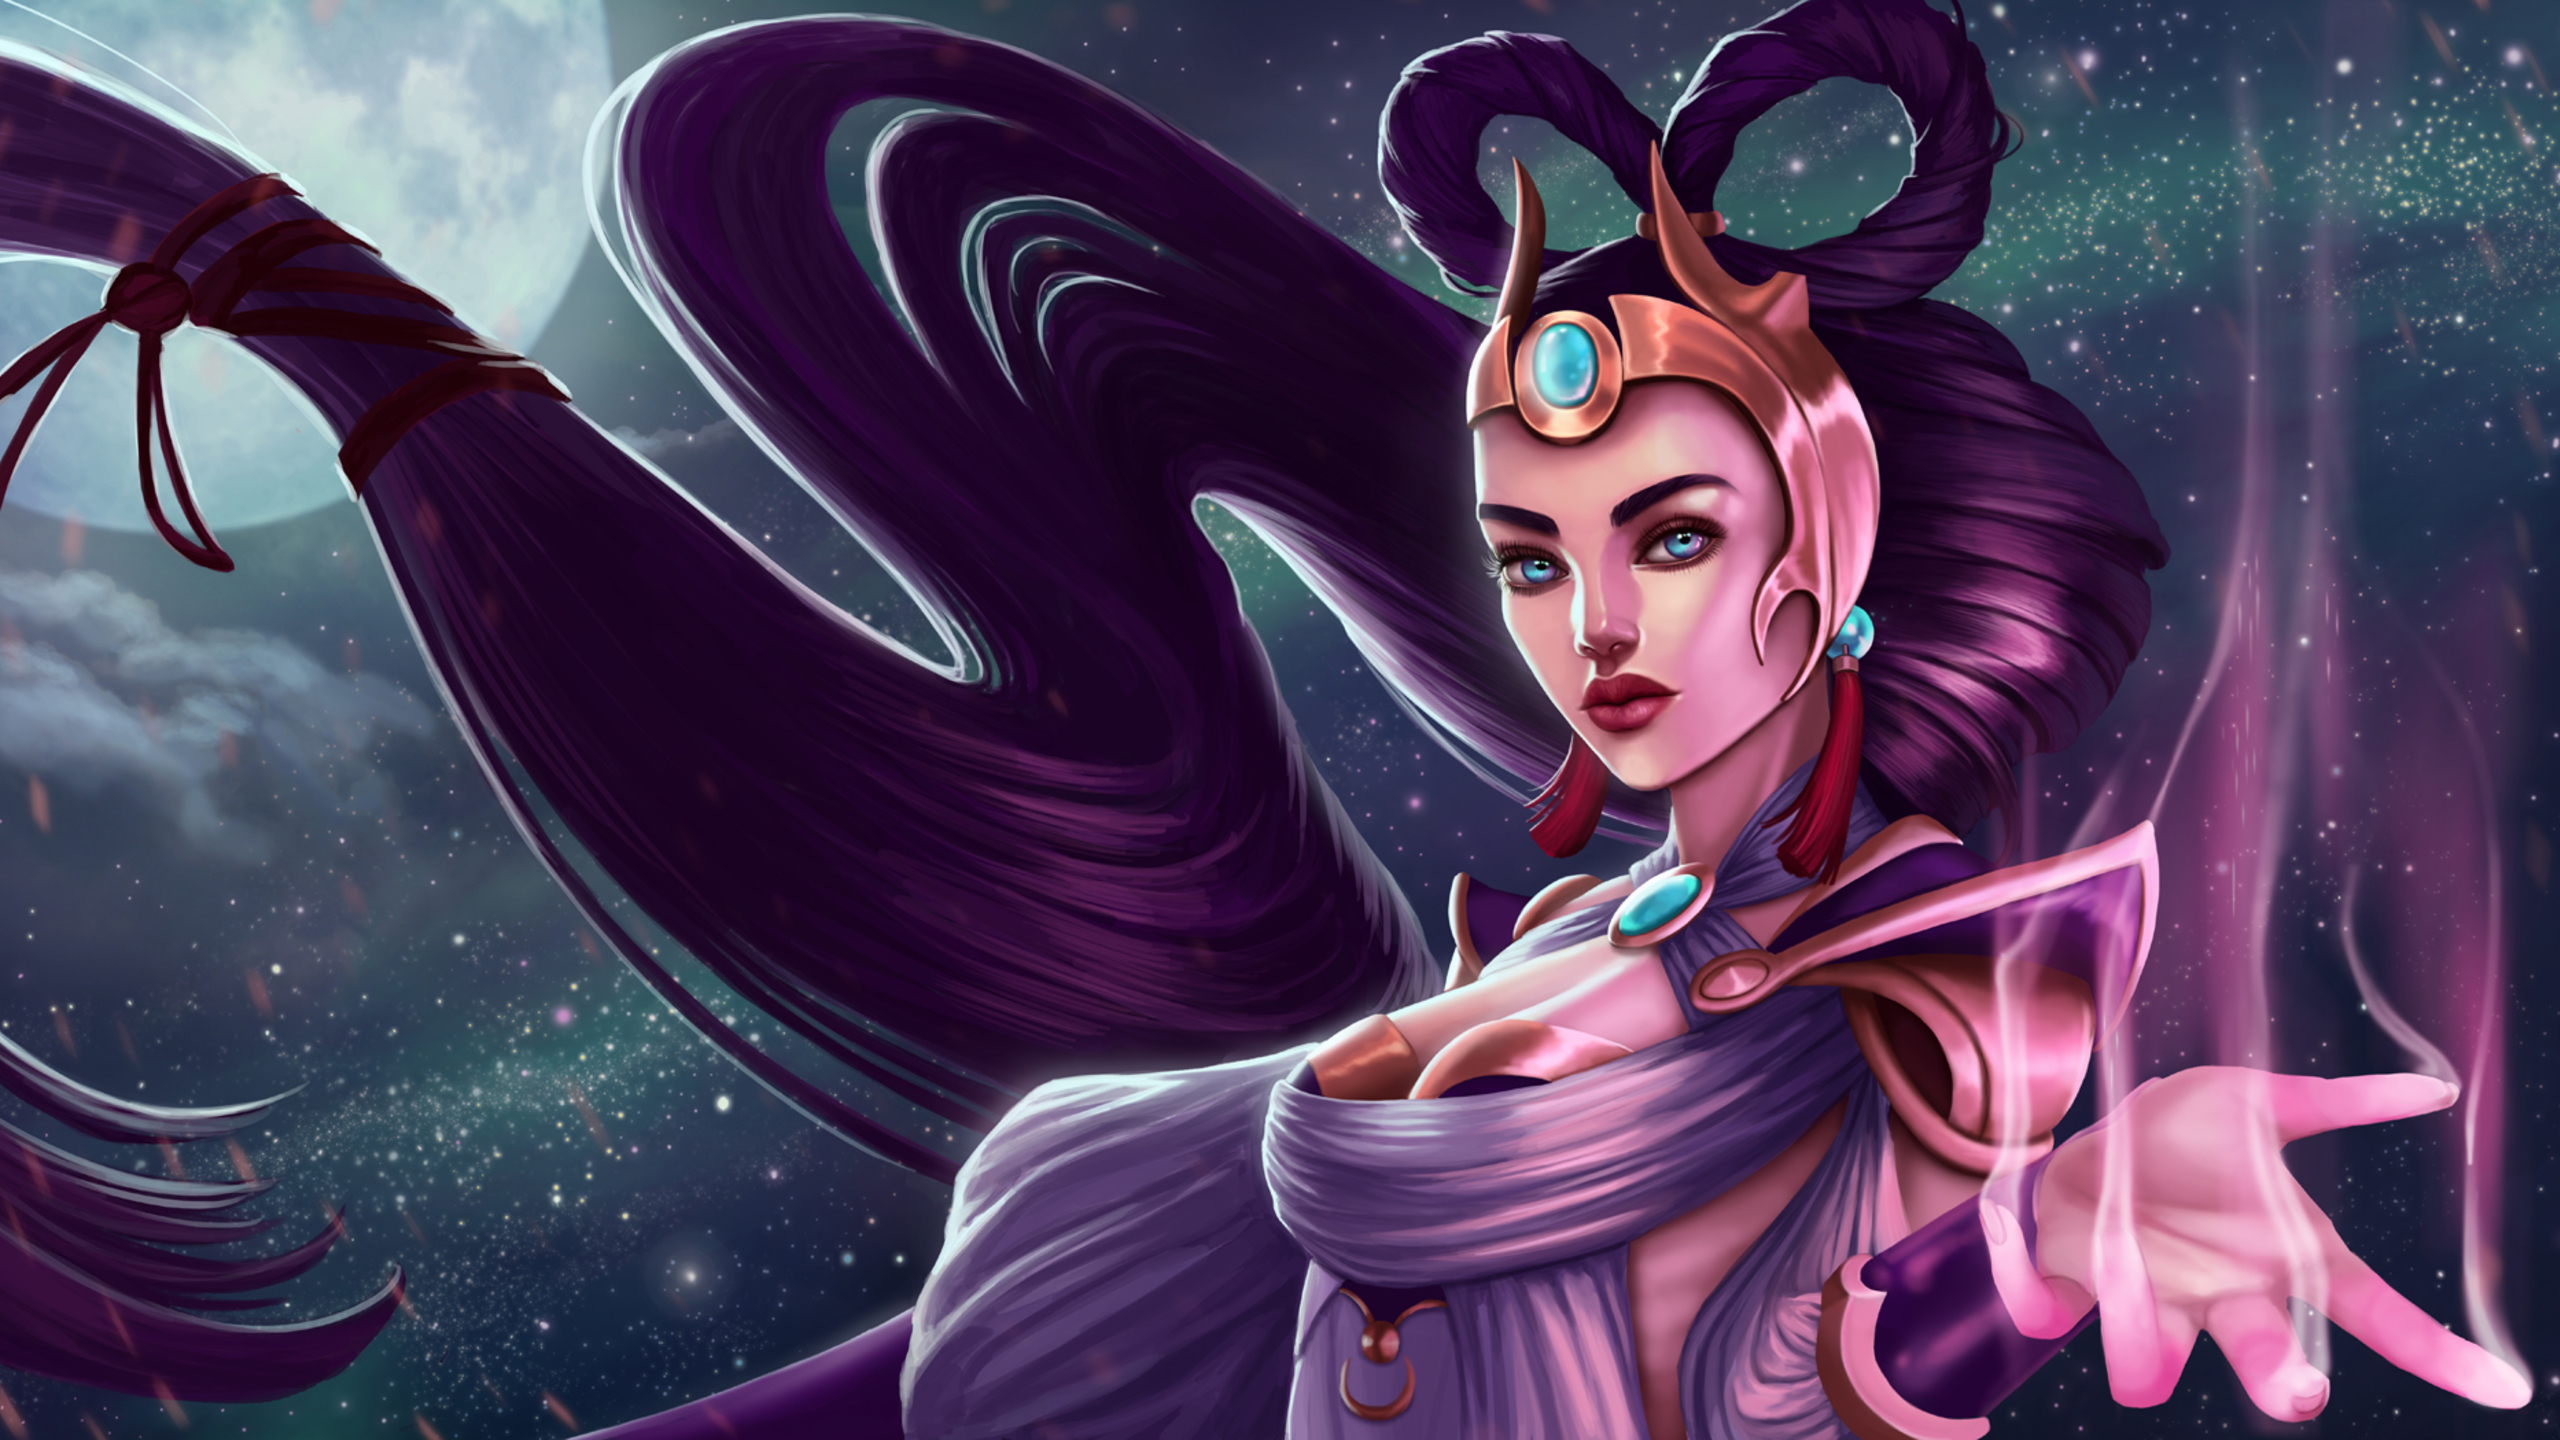 2560x1440 Diana League Of Legends Fantasy Girl 1440p Resolution Hd